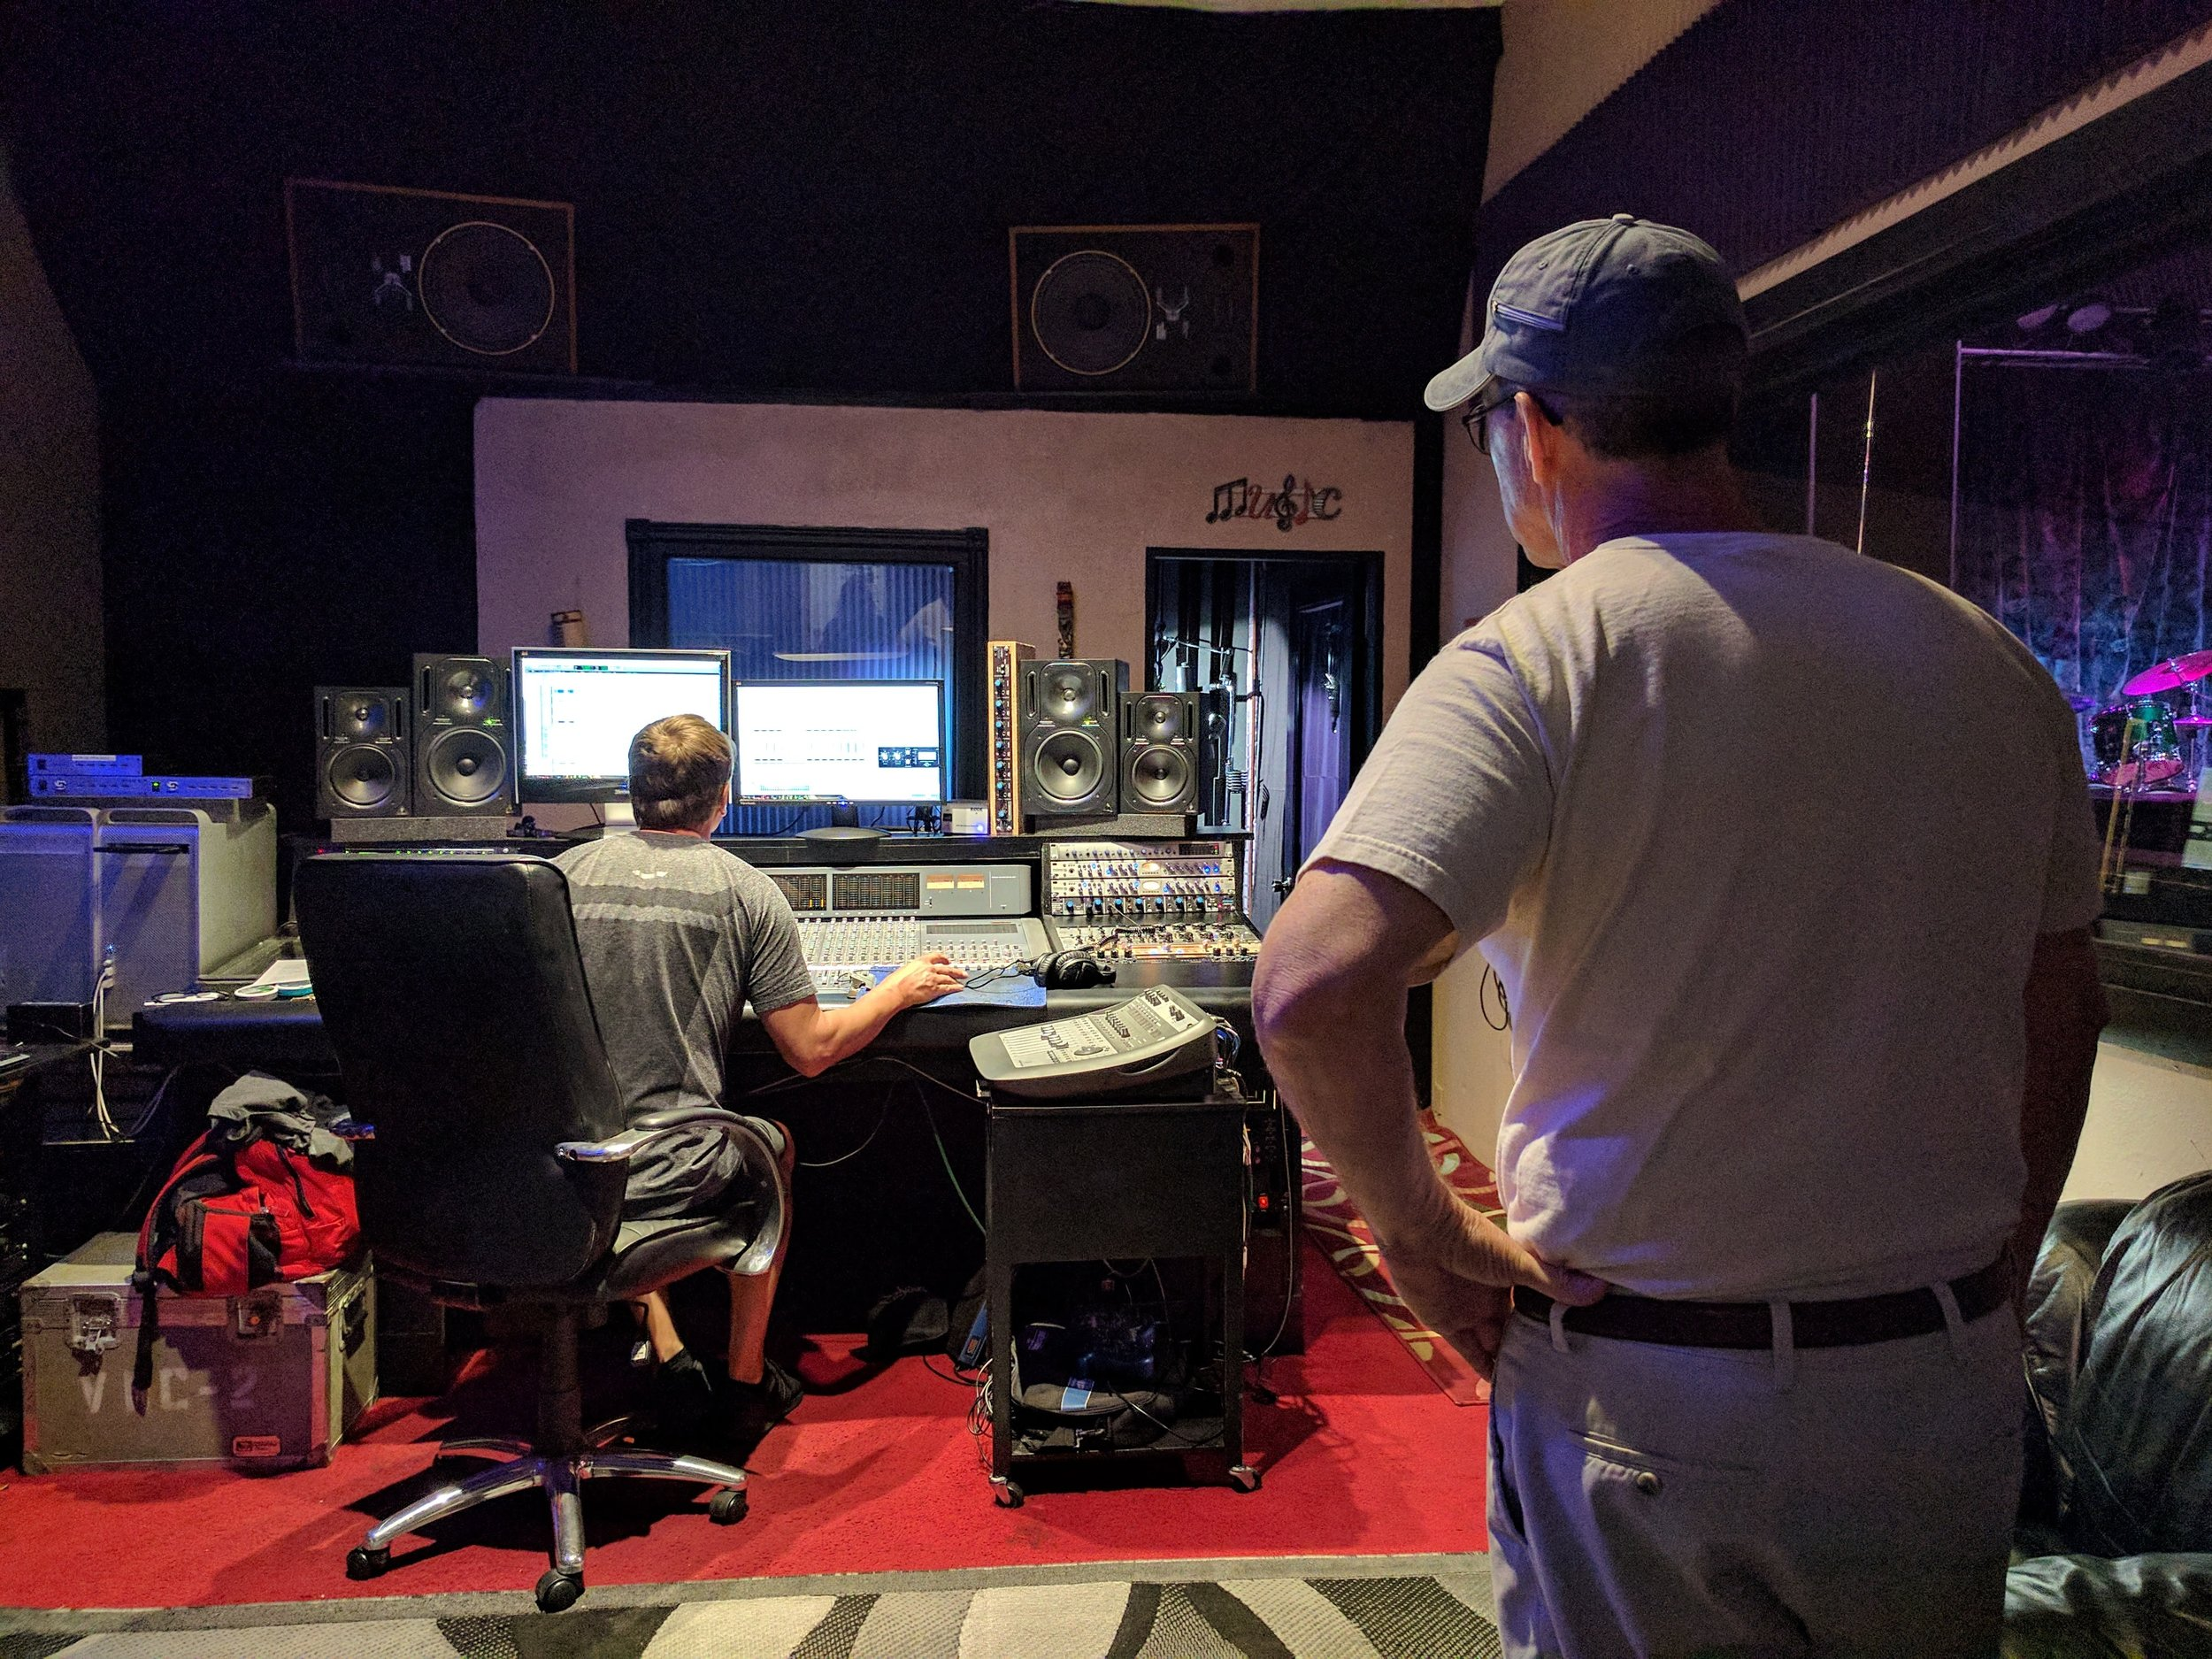 Jody Gray doing his magic at Pro Star Recording Studio, St. Petersburg, FL. 20 April 2017.